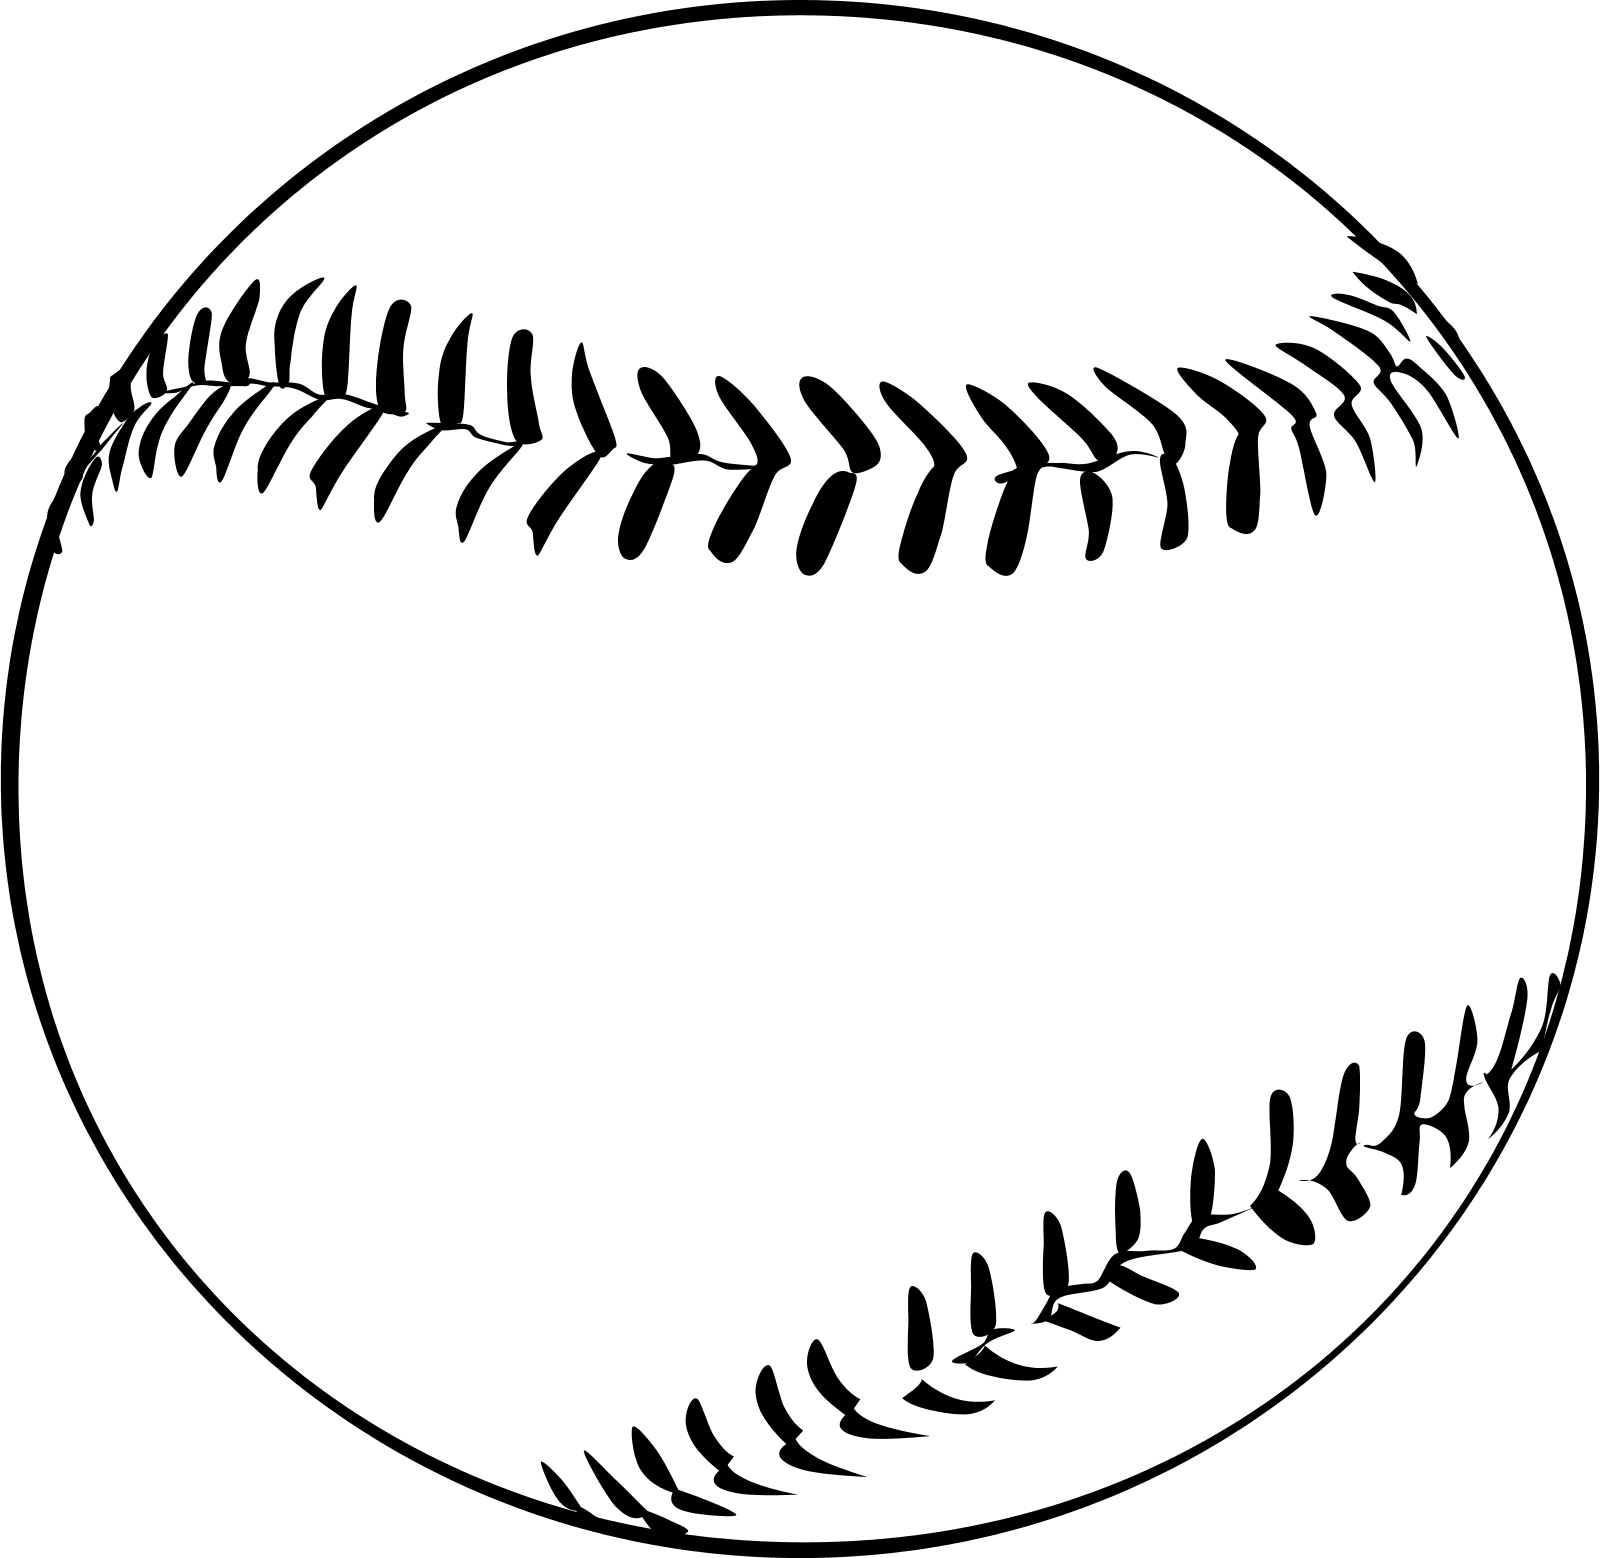 Baseball Graphics Clip Art